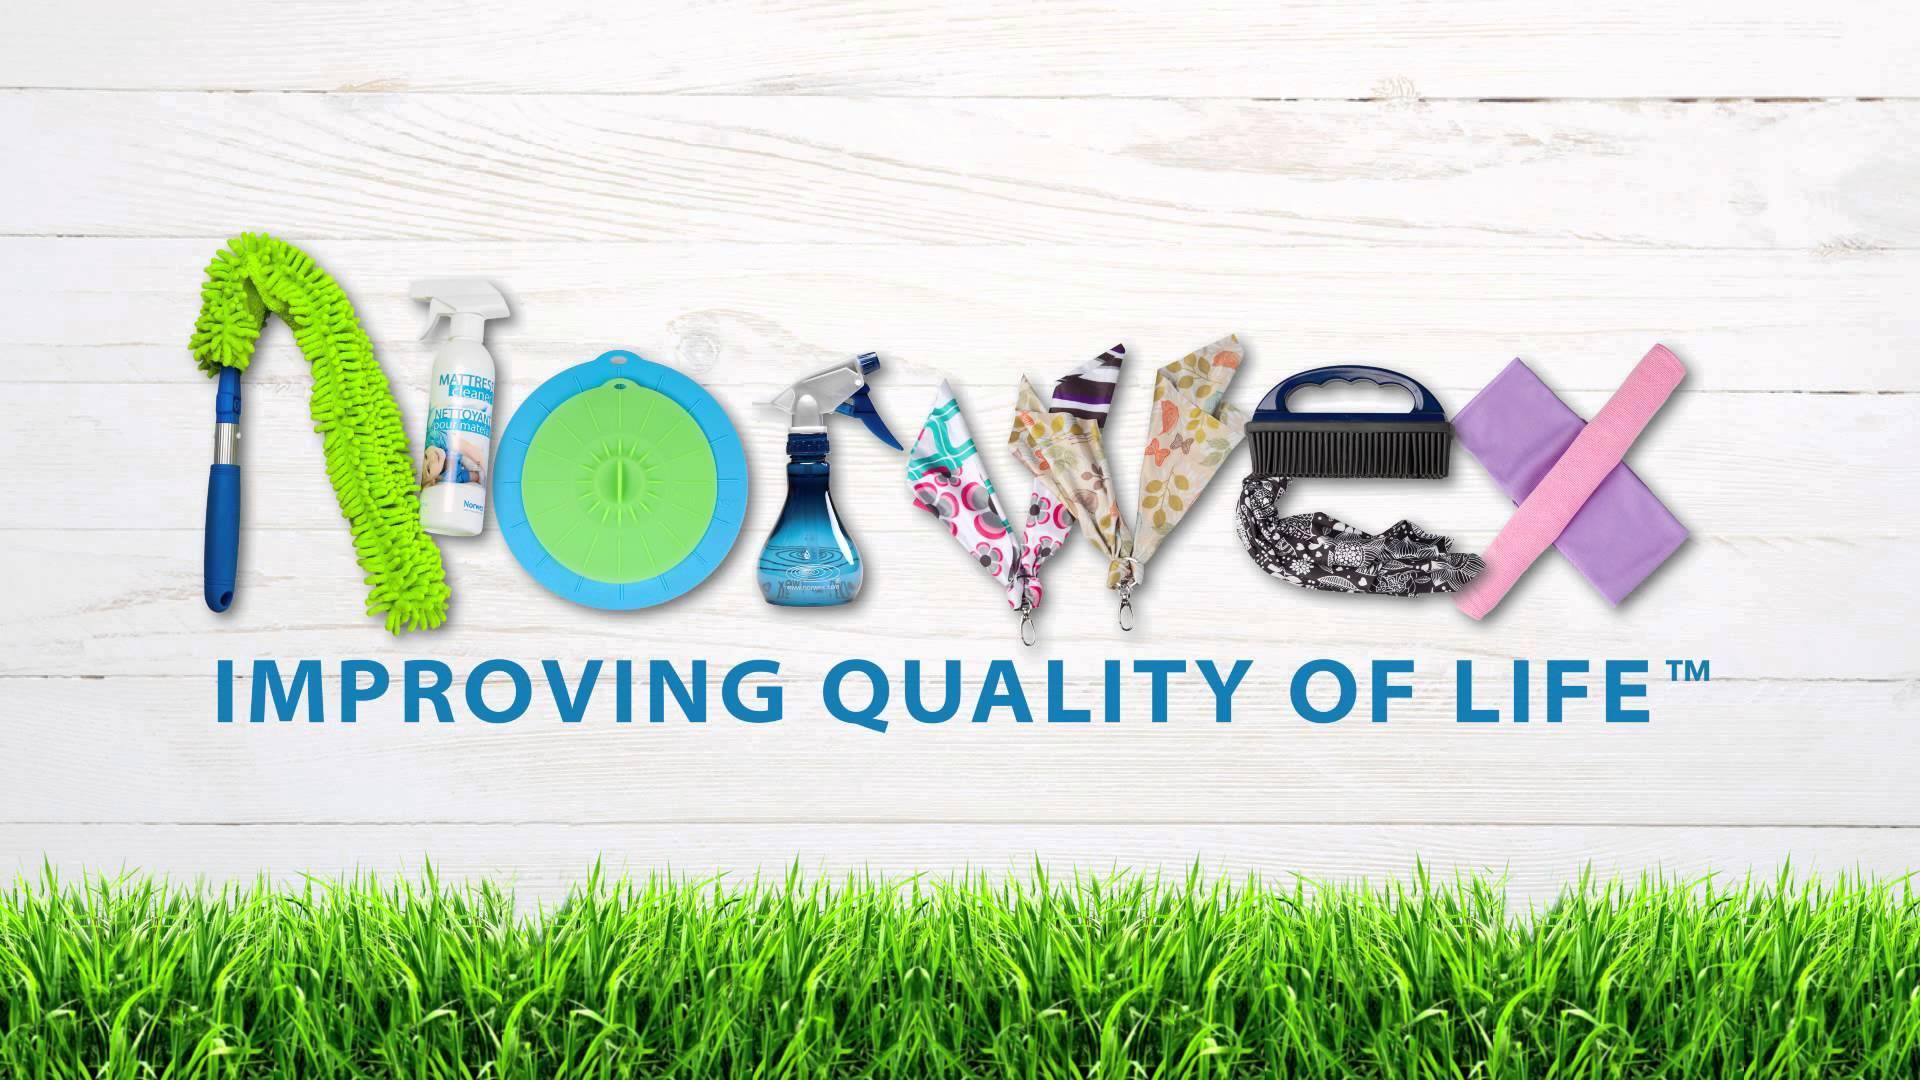 Norwex improving quality of life